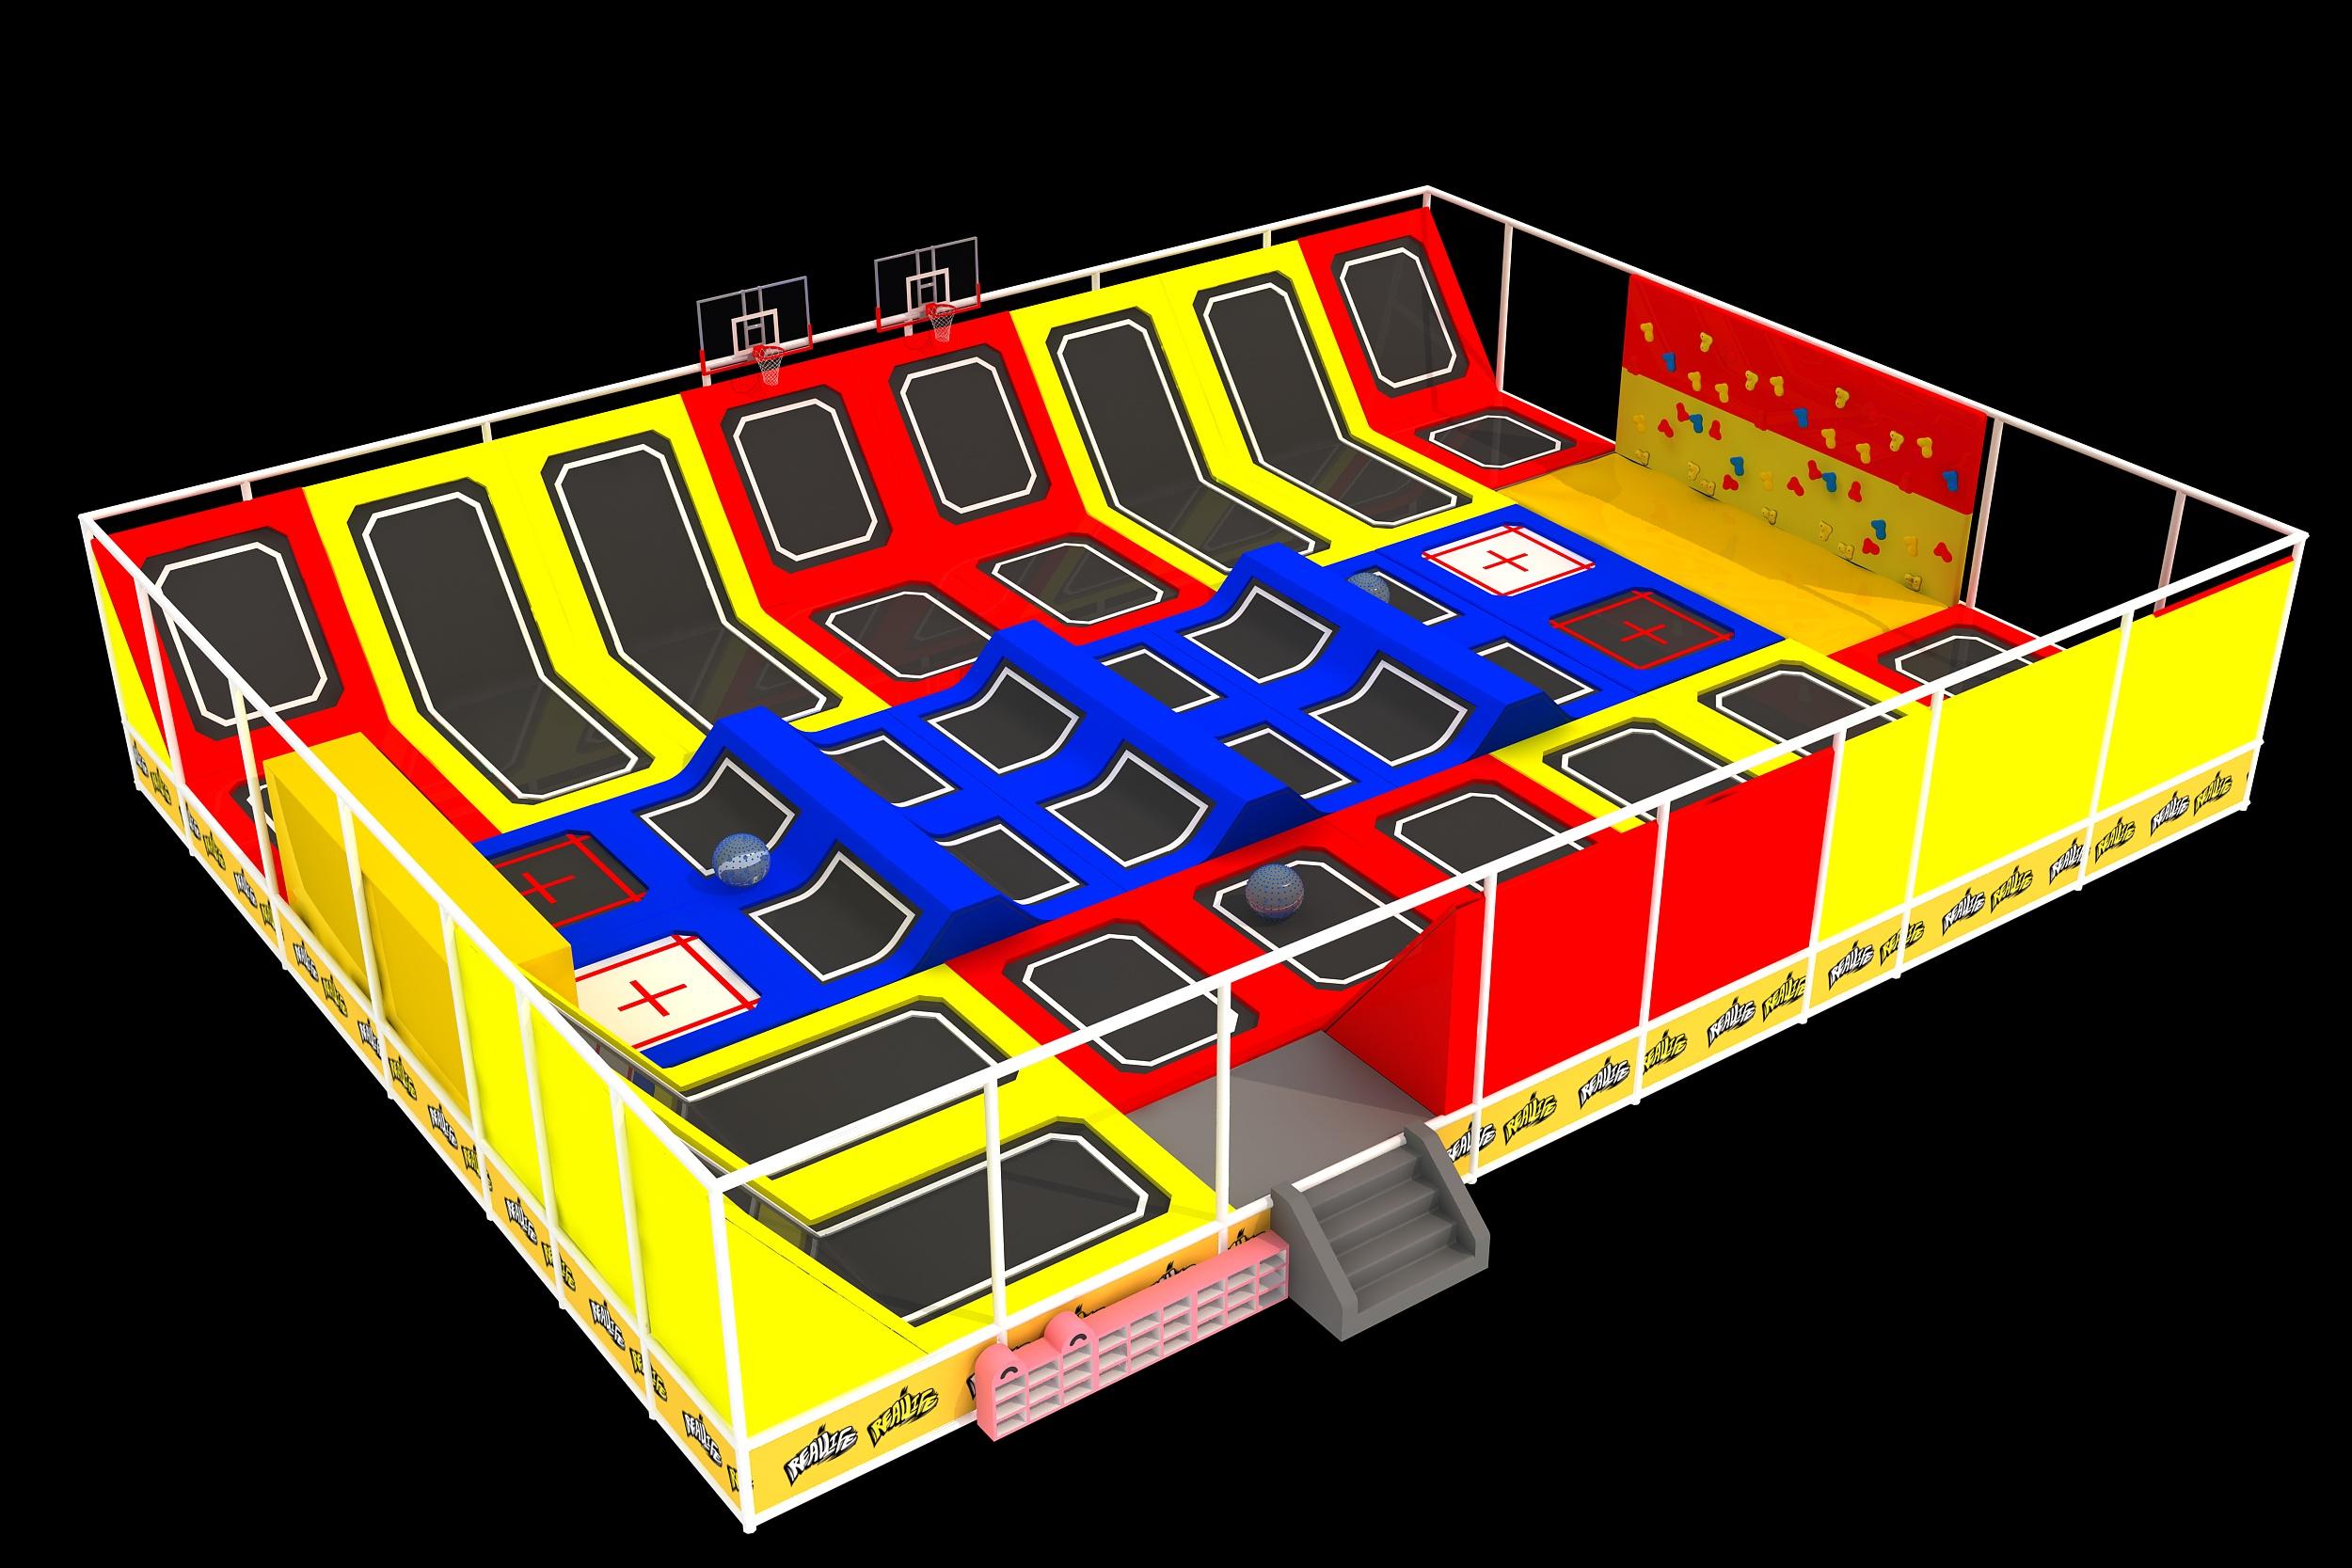 Newest design of the trampoline park for Saudi Arabia Customer